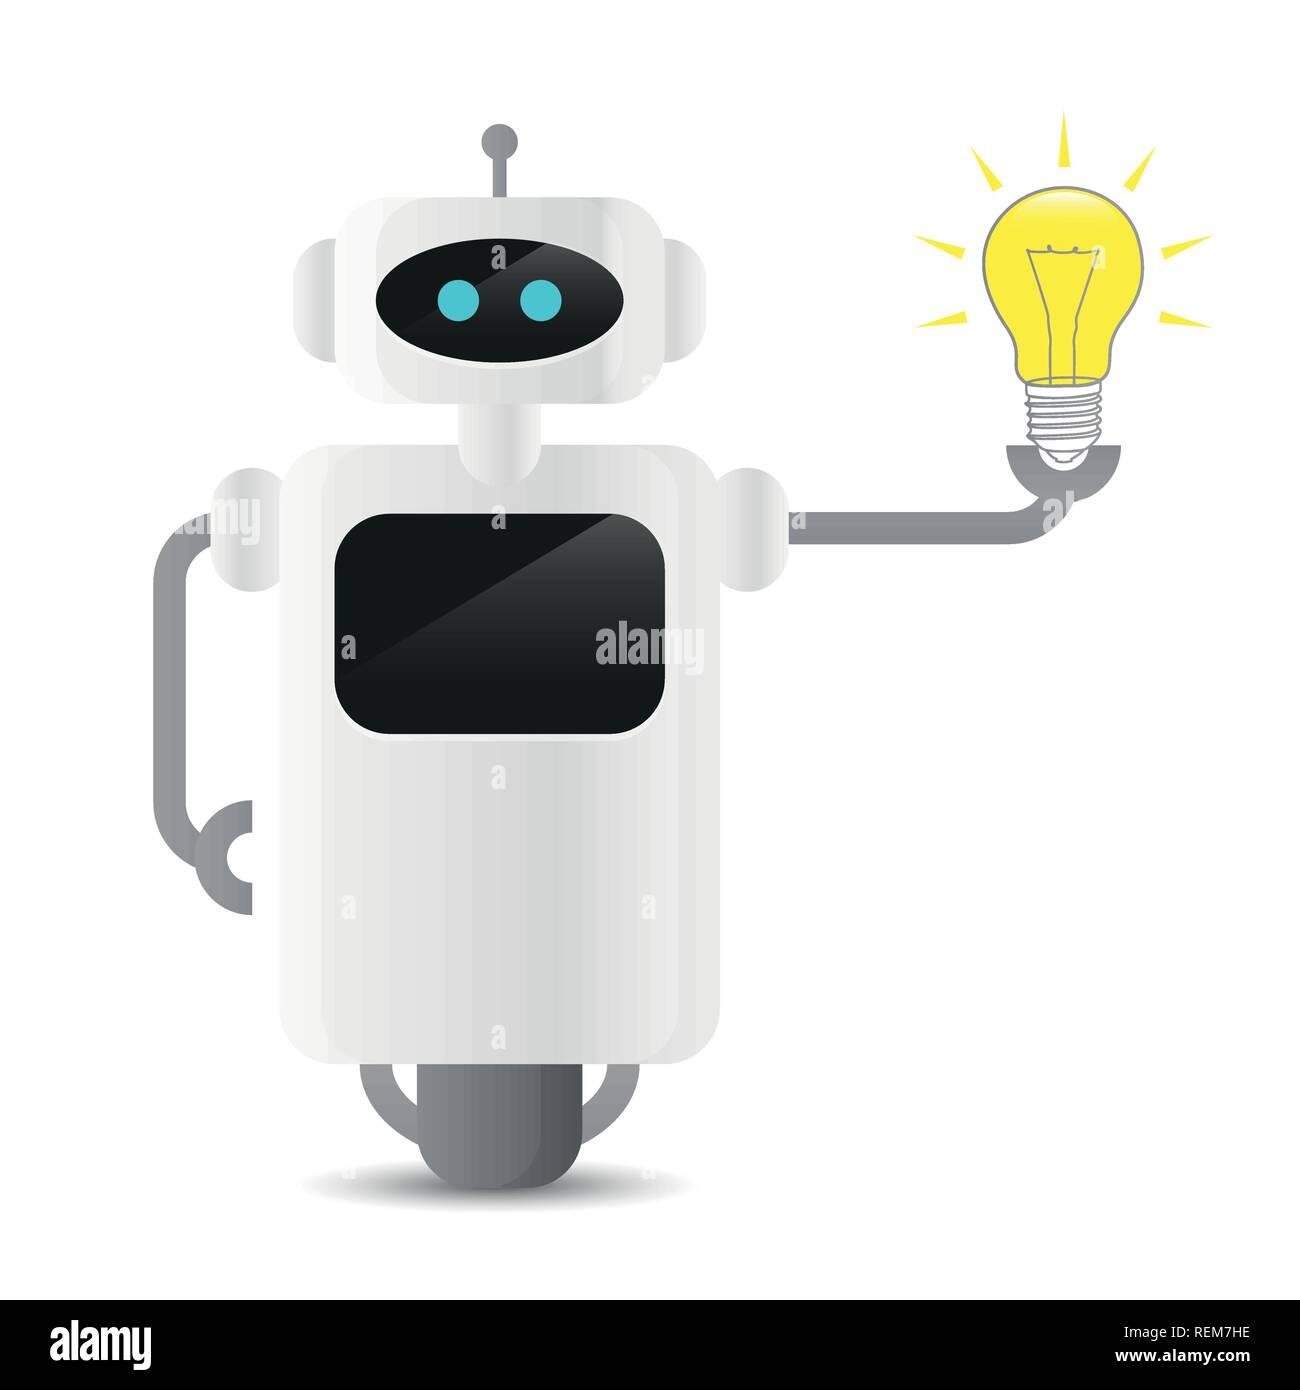 Niedliche Roboter Holding eine Glühbirne Technologie idee Konzept Vektor-illustration EPS 10. Stock Vektor